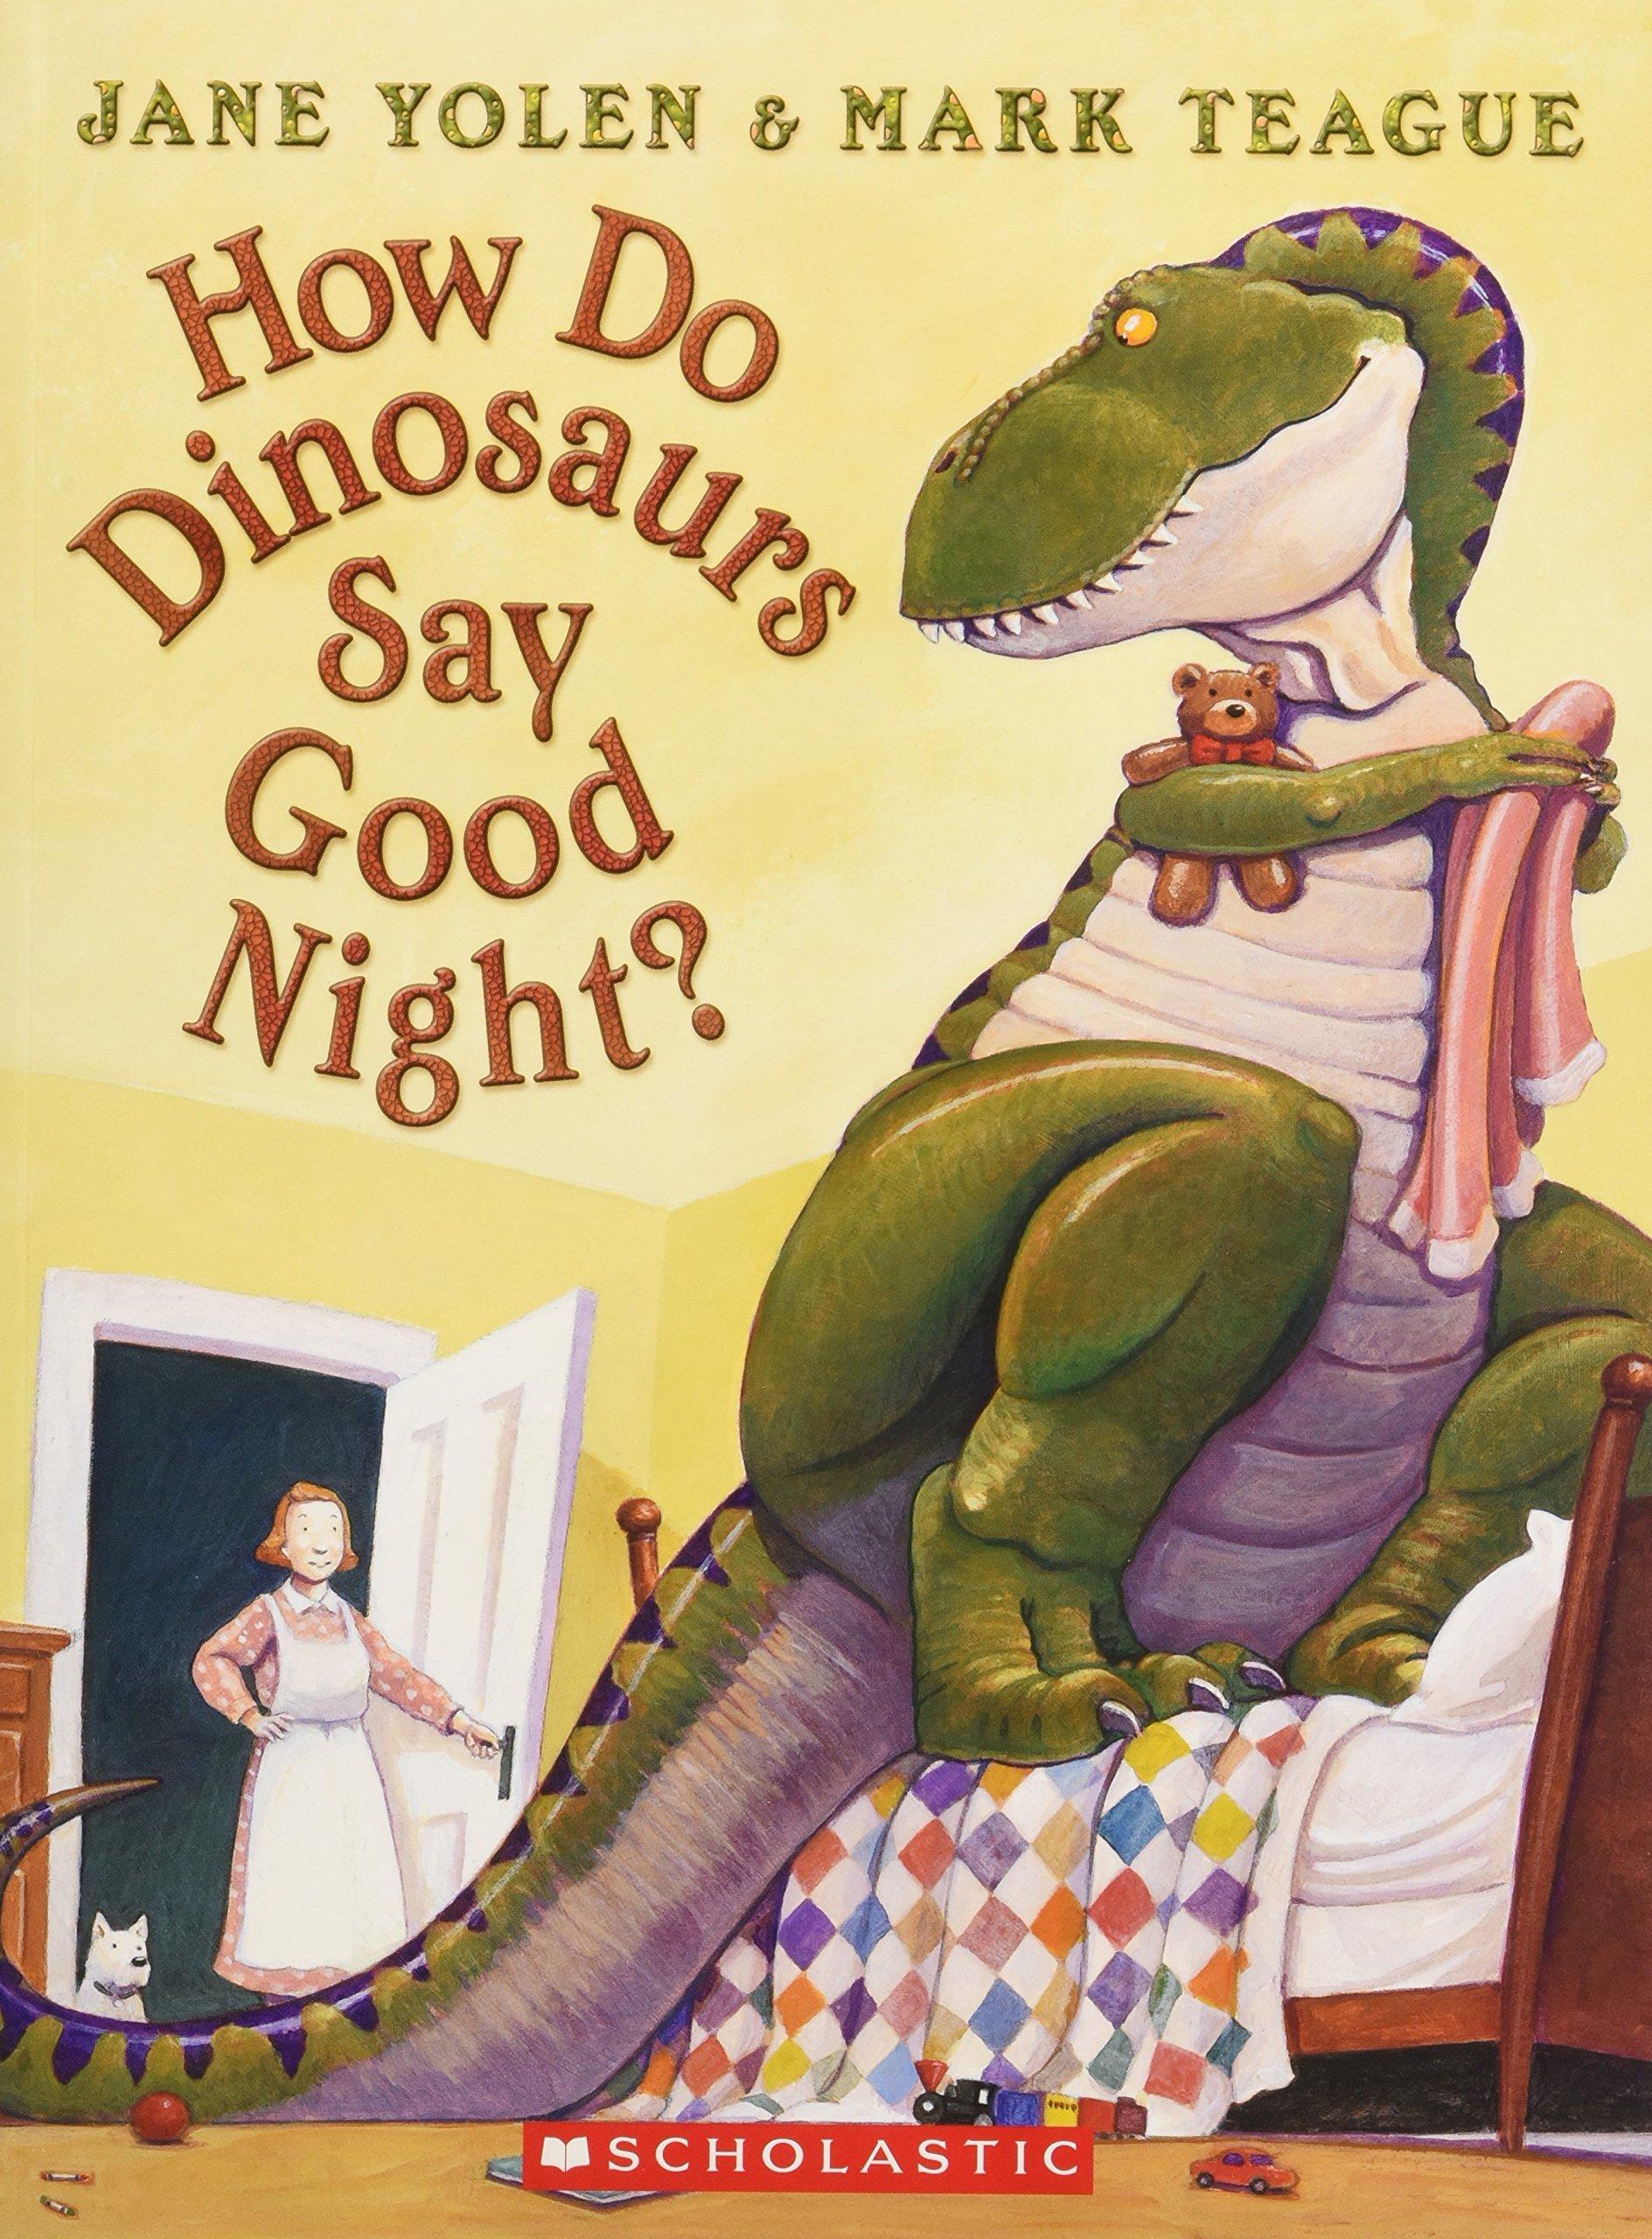 How Do Dinosaurs Say Good Night?: Yolen, Jane, Teague, Mark, Yolen, Jane: 9780545093194: Amazon.com: Books